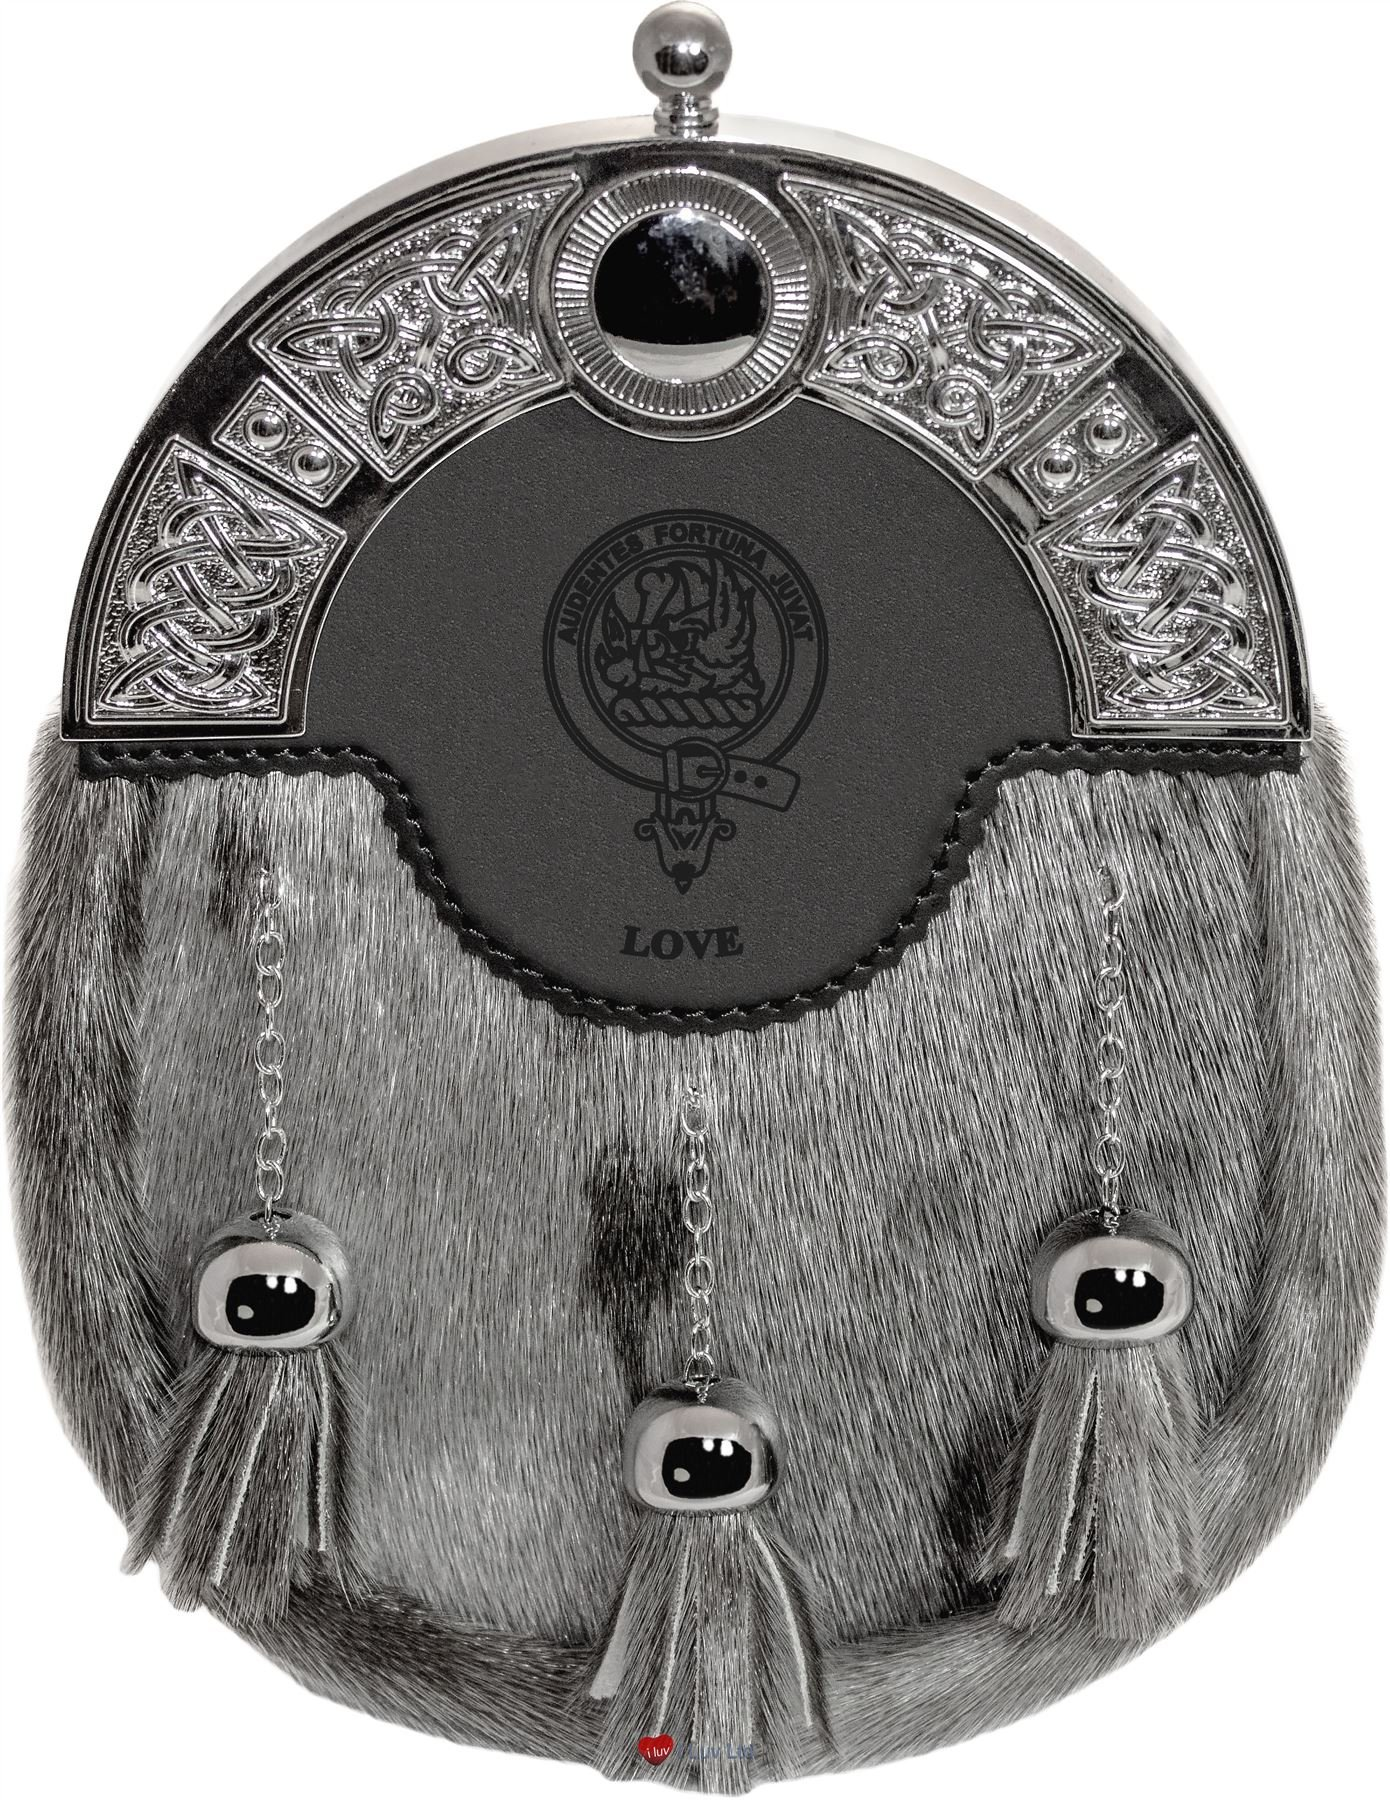 Love Dress Sporran 3 Tassels Studded Targe Celtic Arch Scottish Clan Name Crest